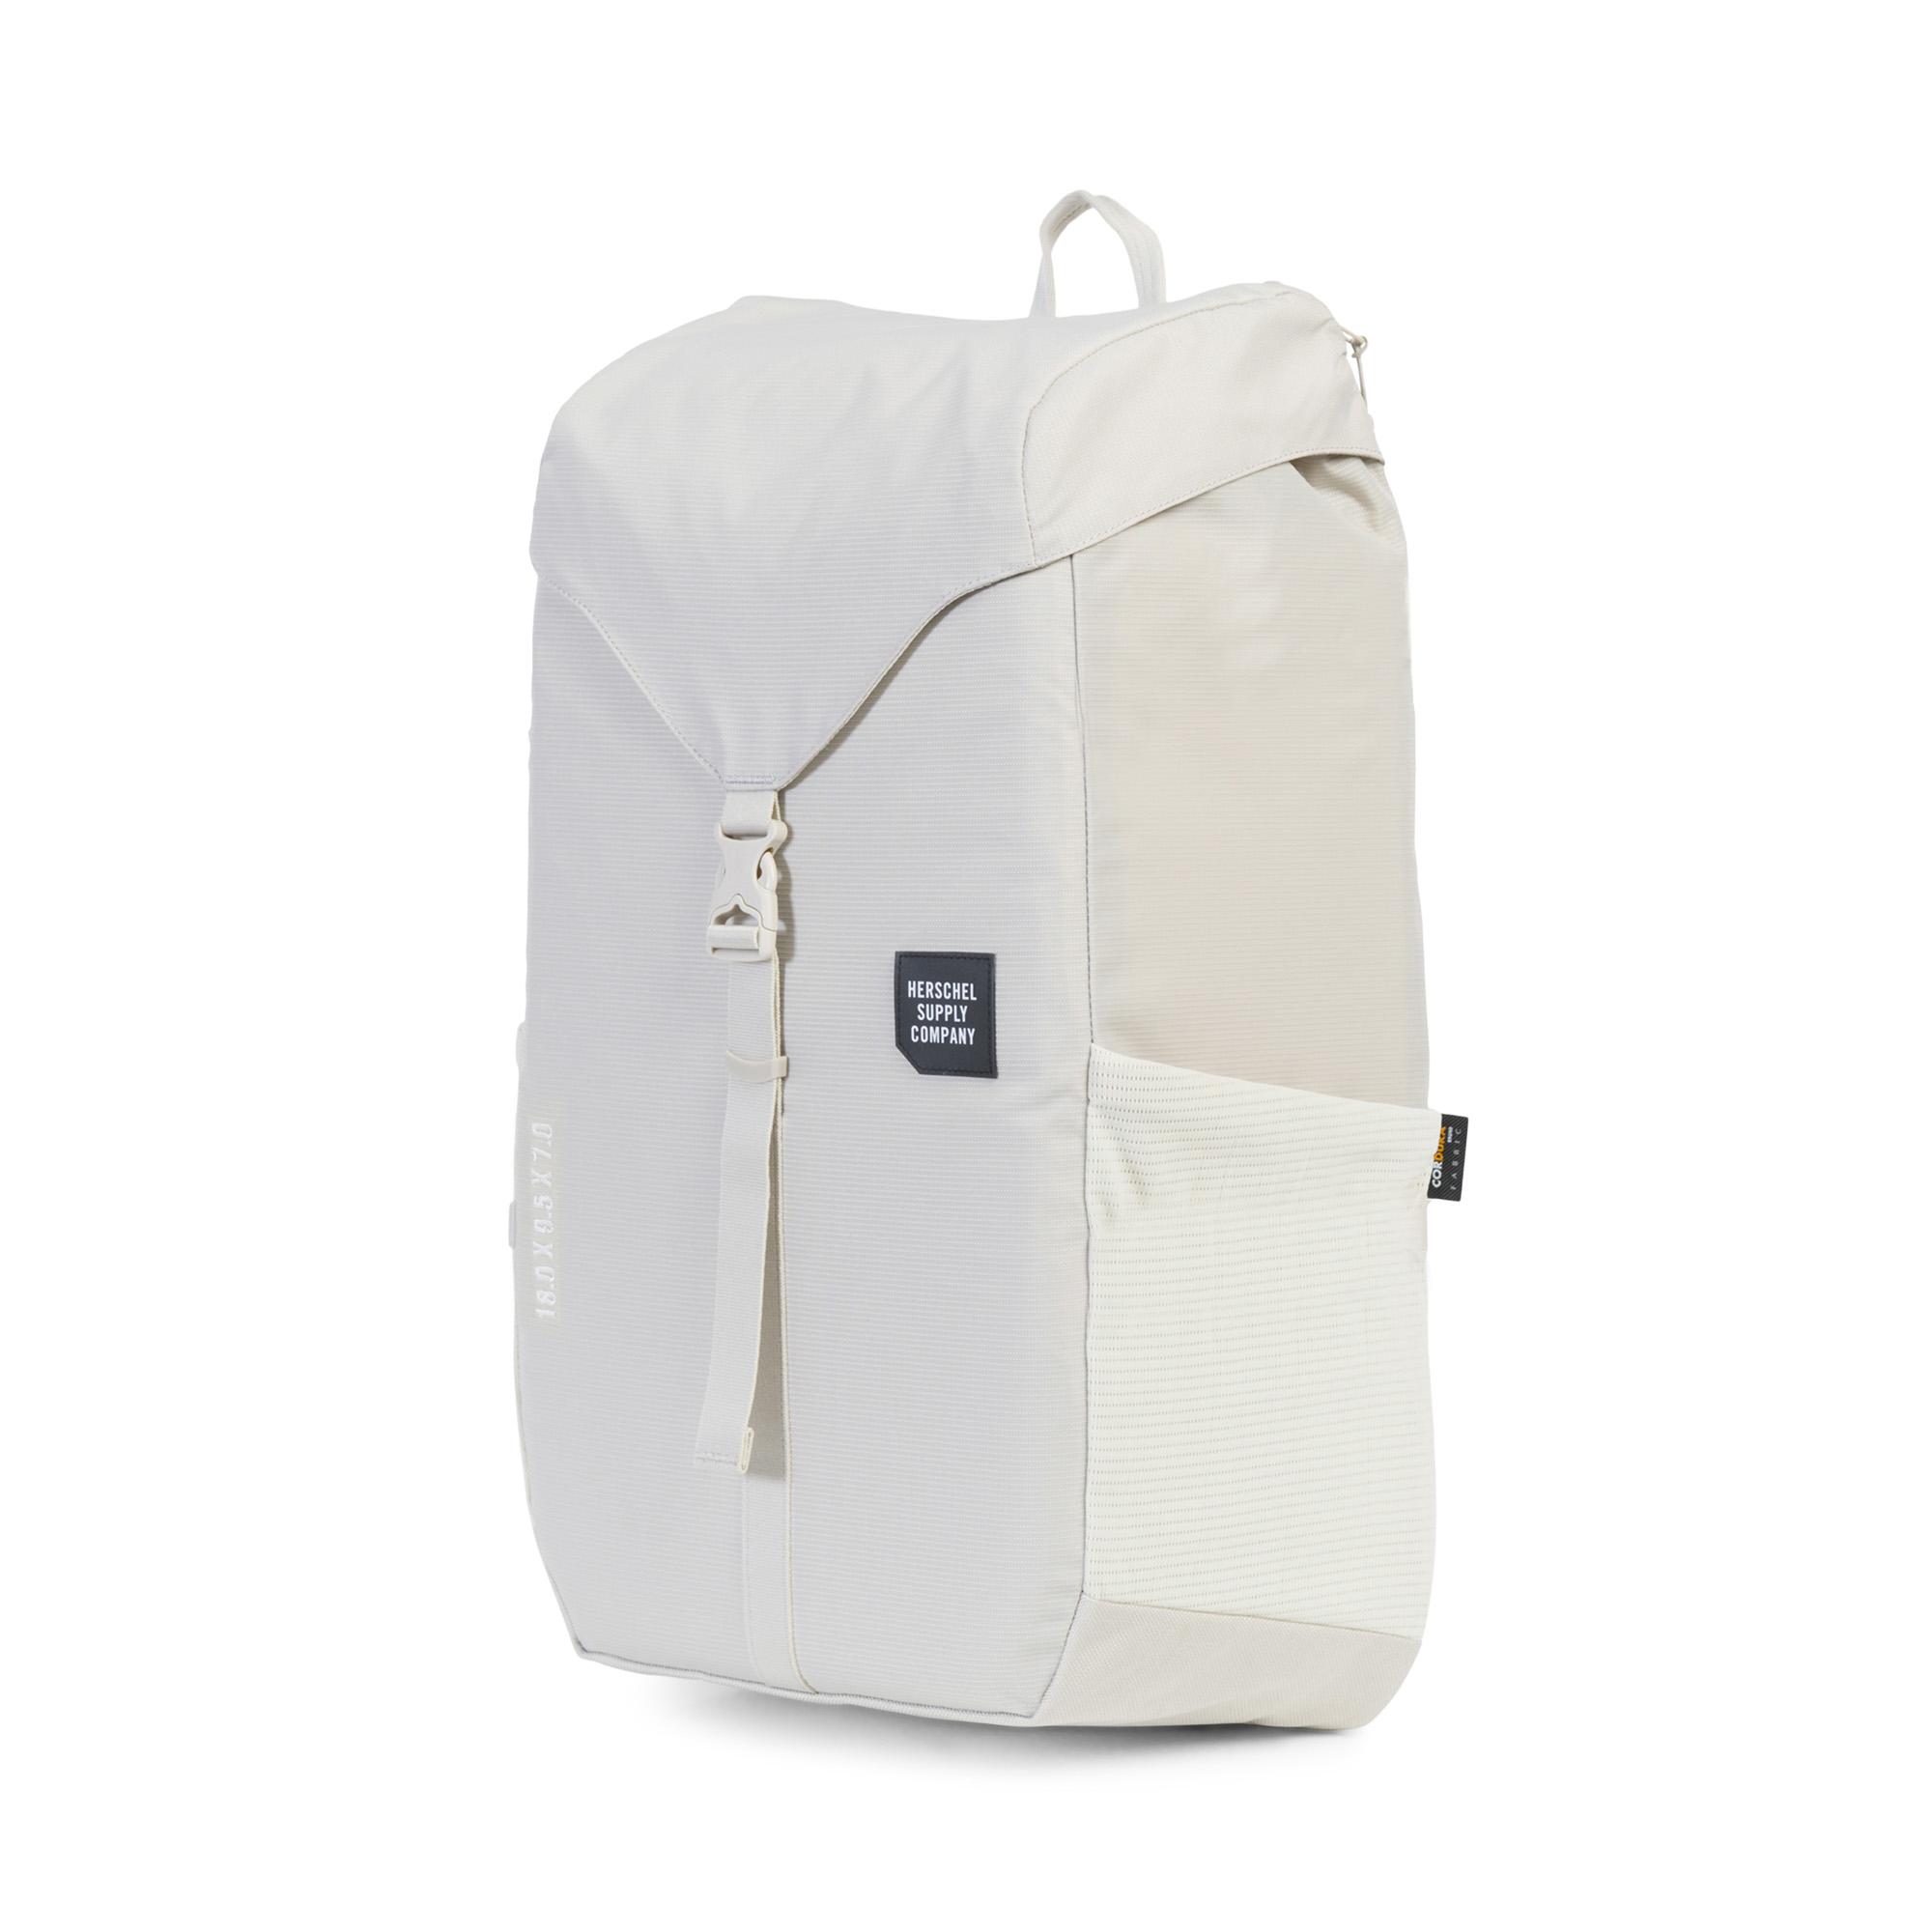 46c5fb5c1c2 Barlow Backpack Medium